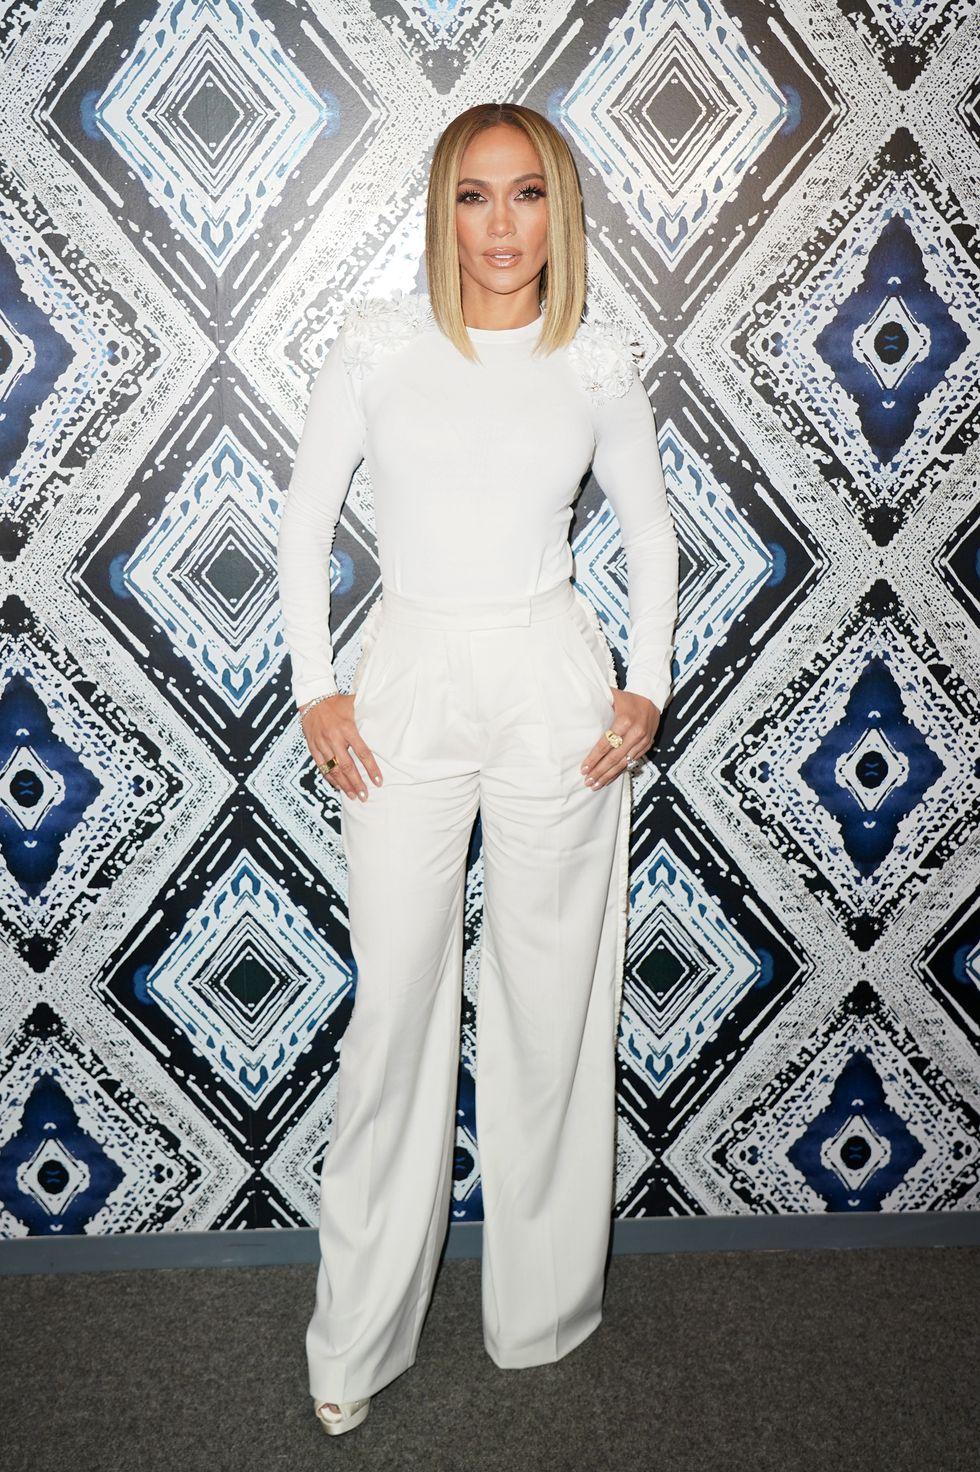 Jennifer Lopez - white outfit